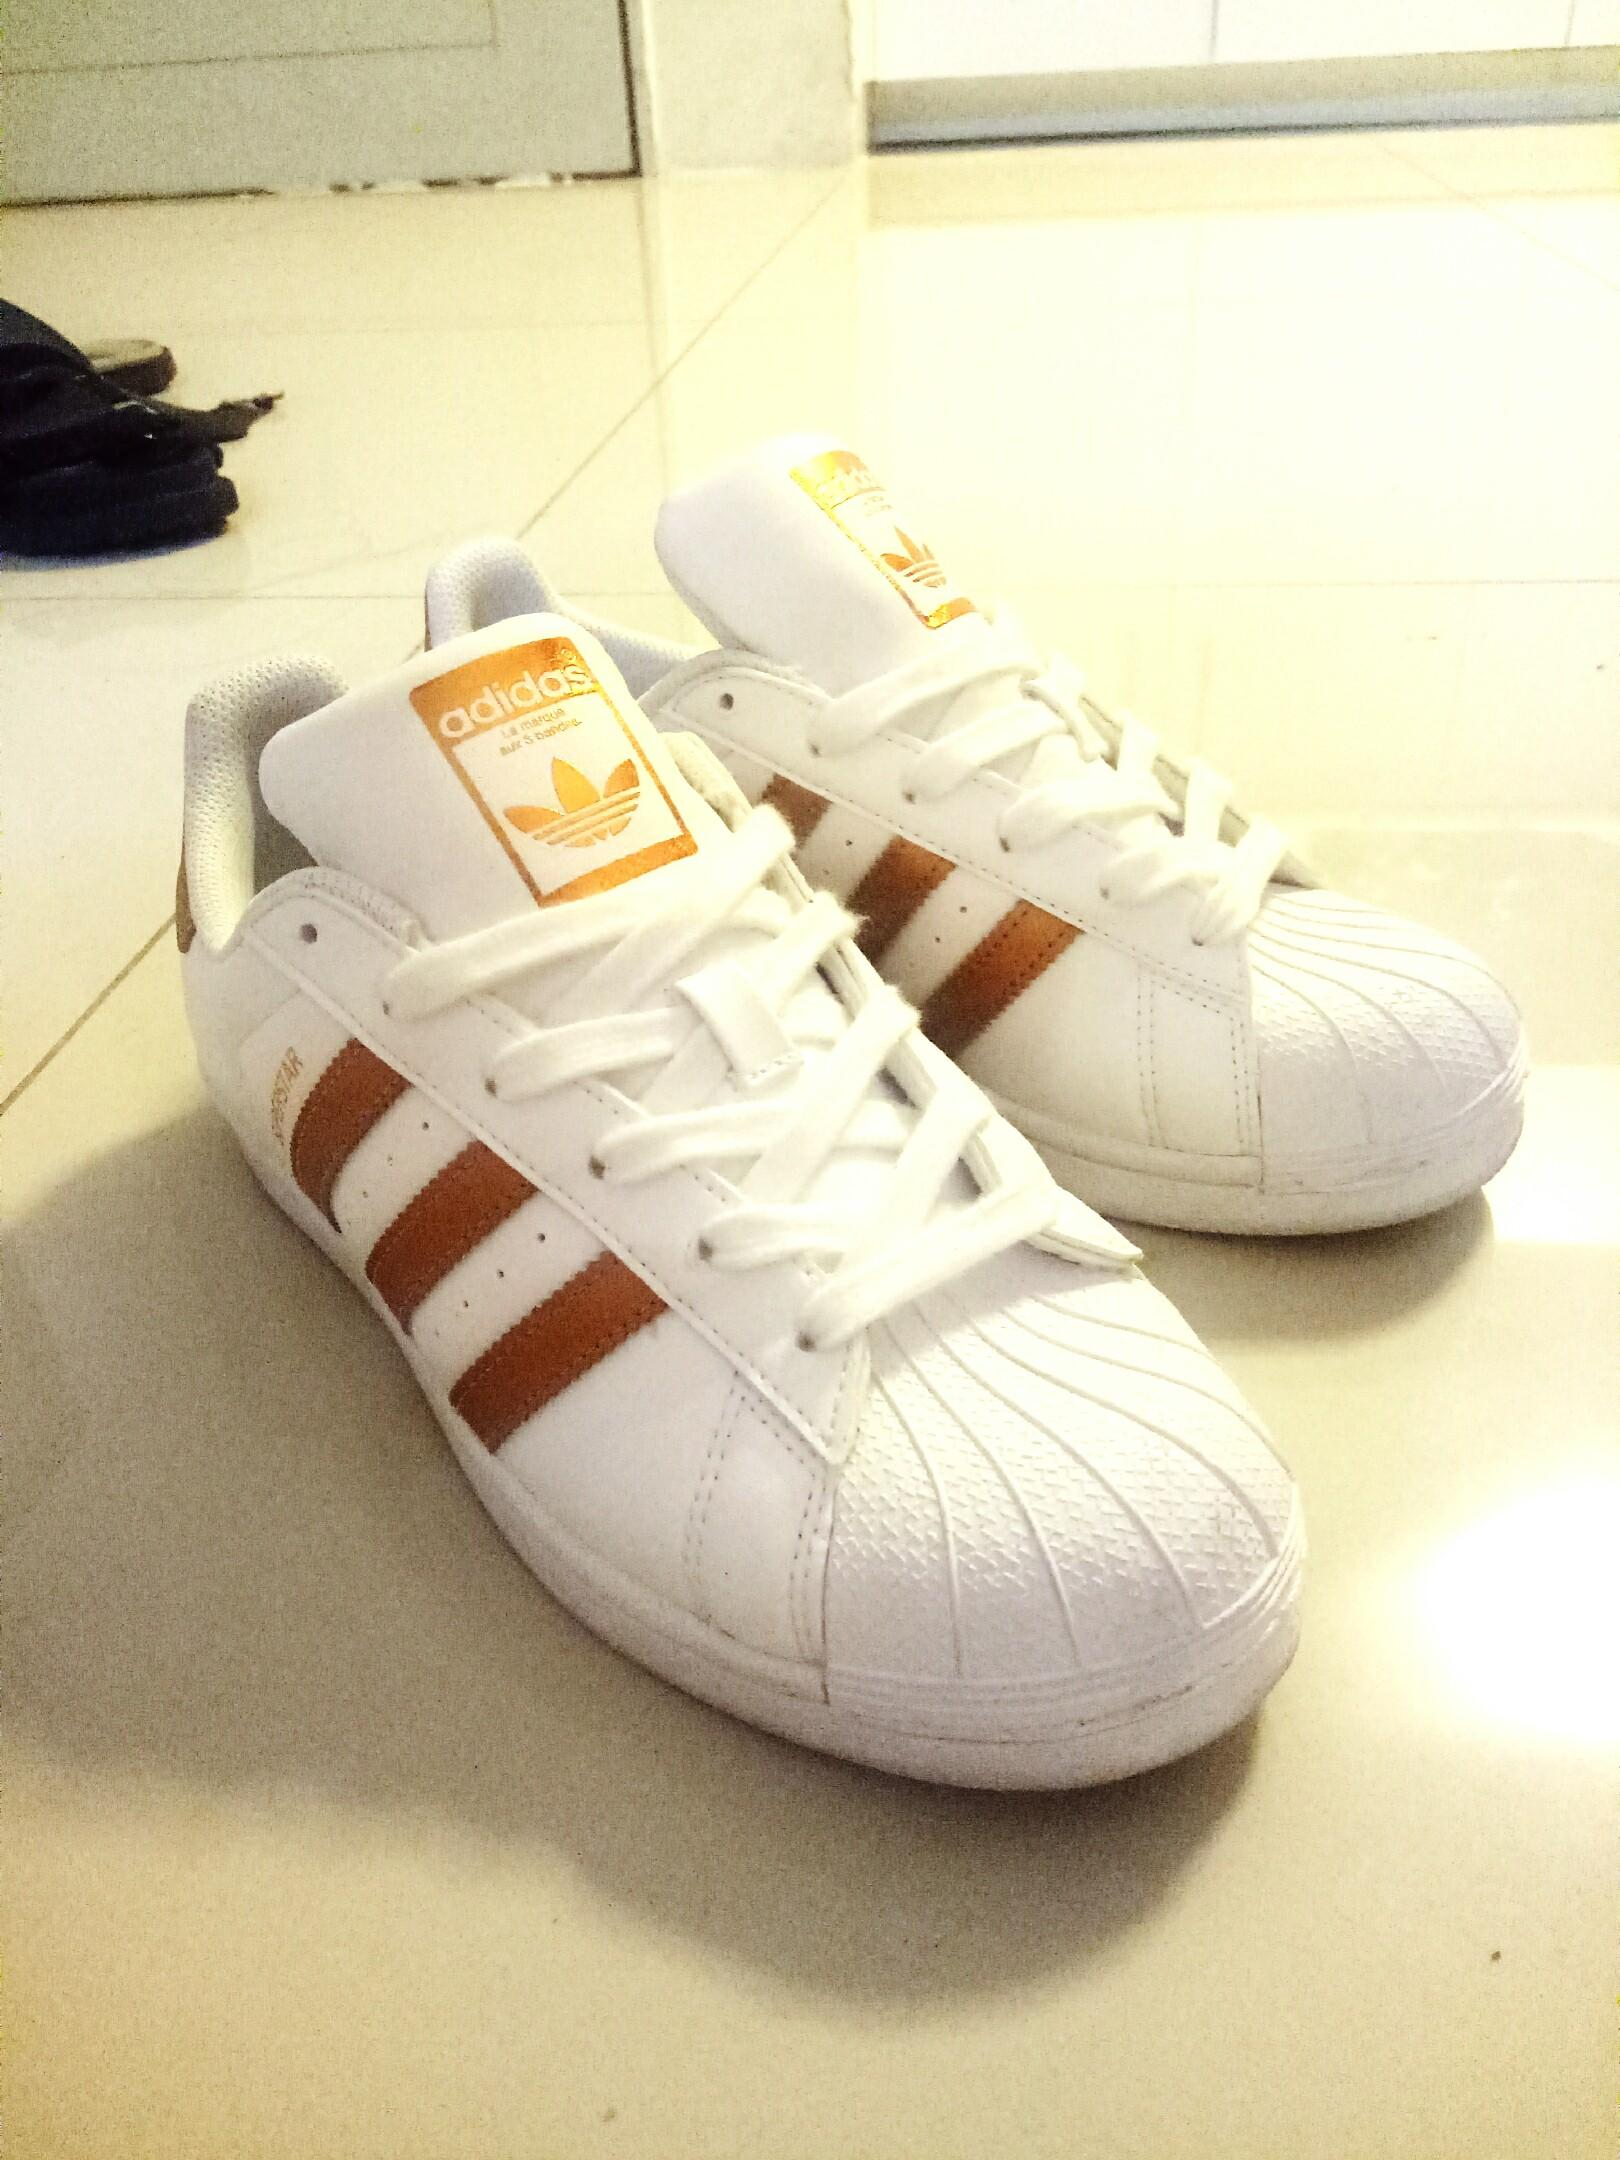 Adidas Superstar original gold&white, Women's Fashion, Shoes ...